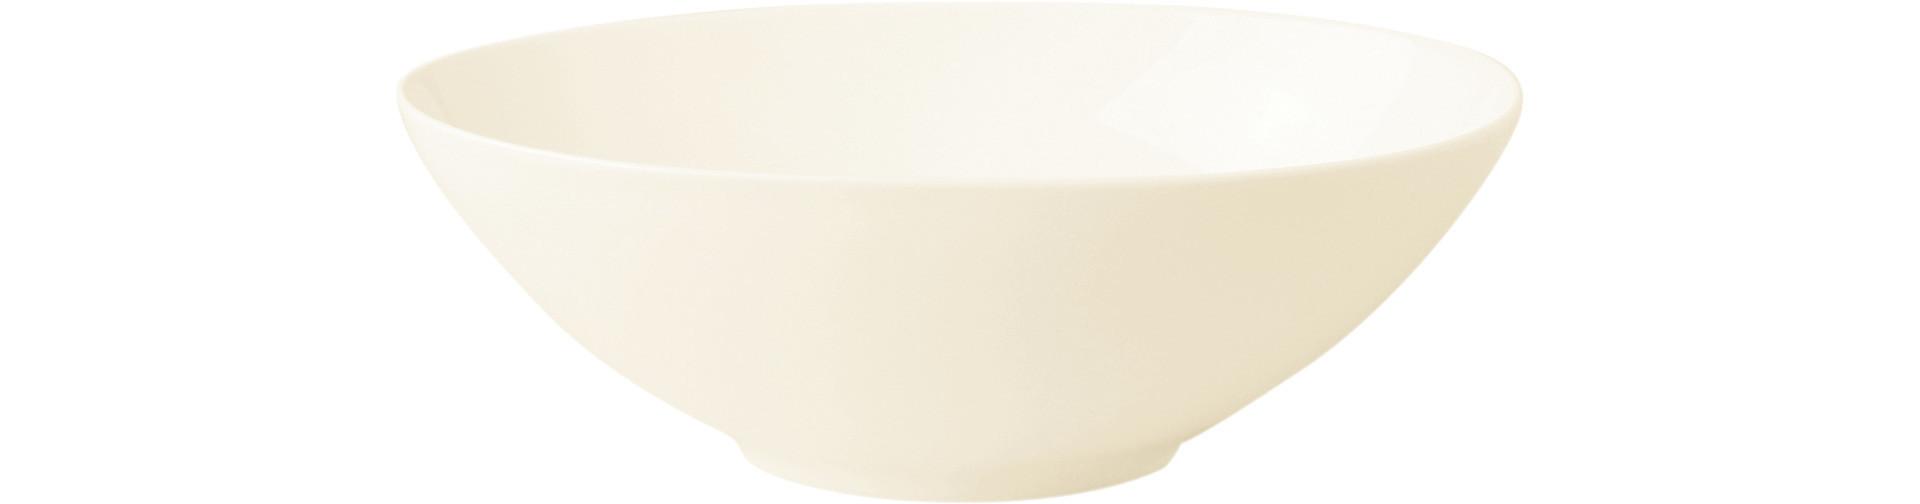 Fine Dine, Salatschale oval 270 x 190 mm / 1,07 l creme